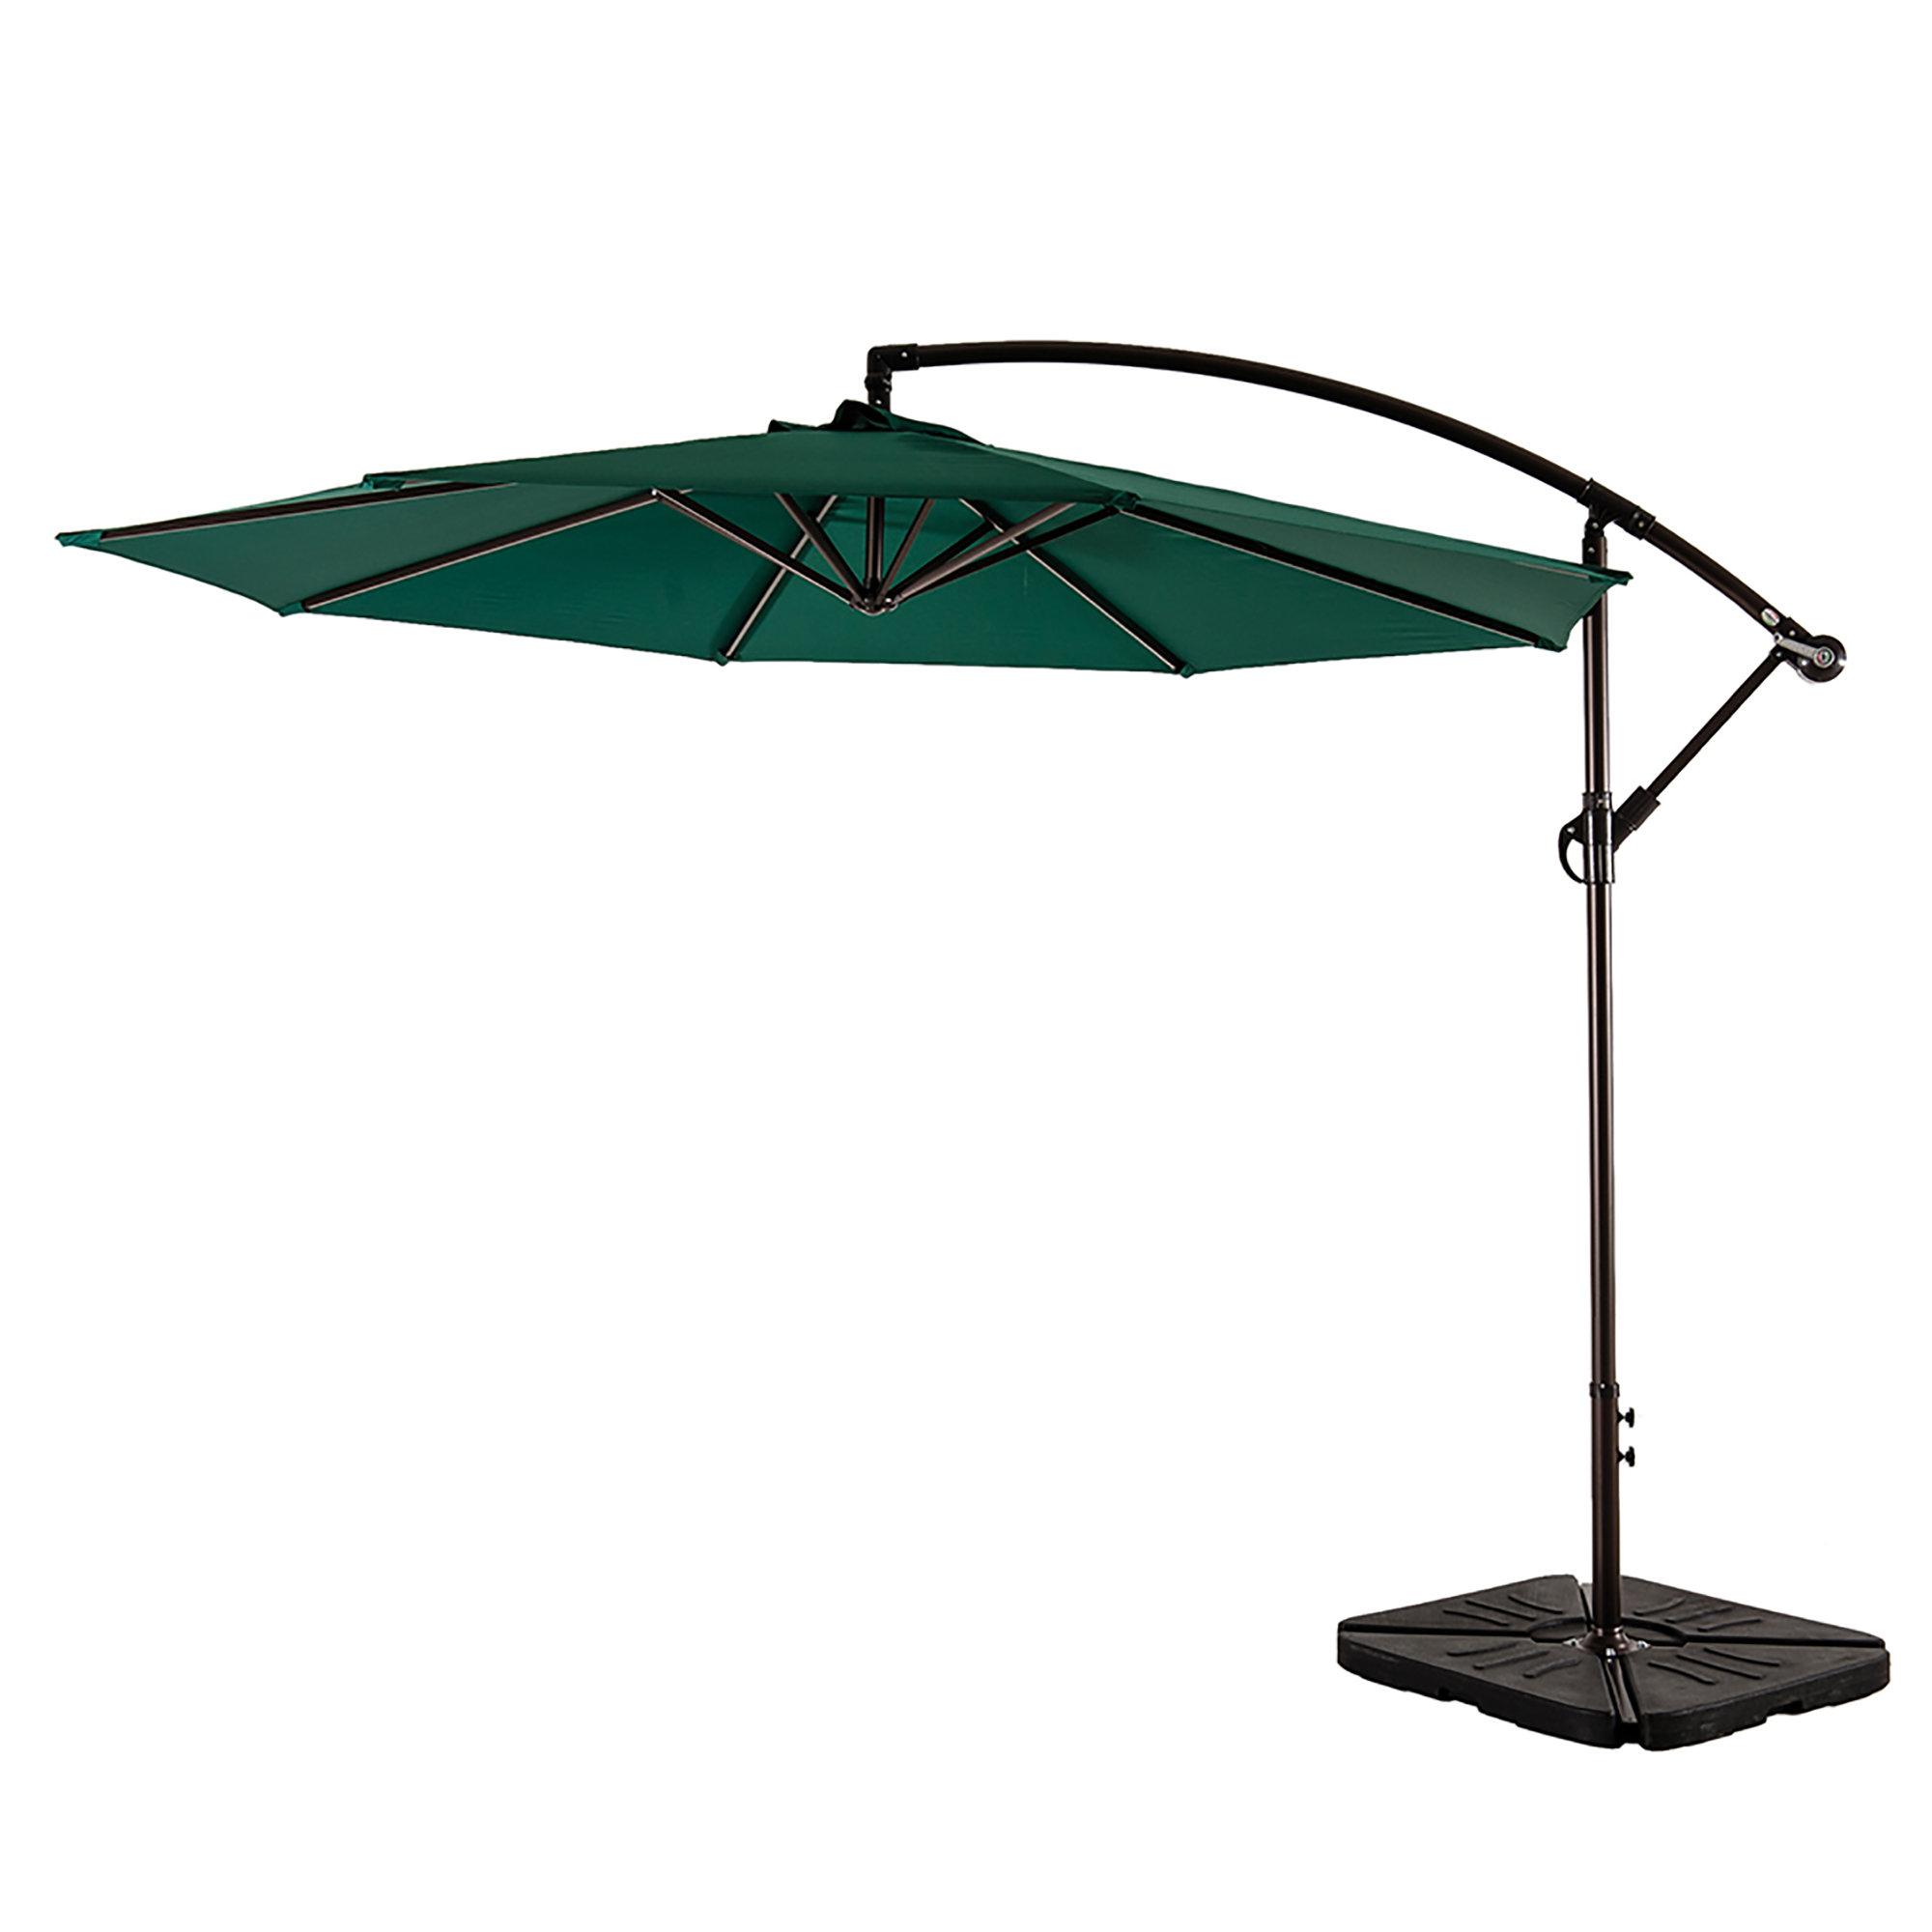 Vassalboro Cantilever Umbrellas Inside Most Recent Karr 10' Cantilever Umbrella (View 15 of 20)